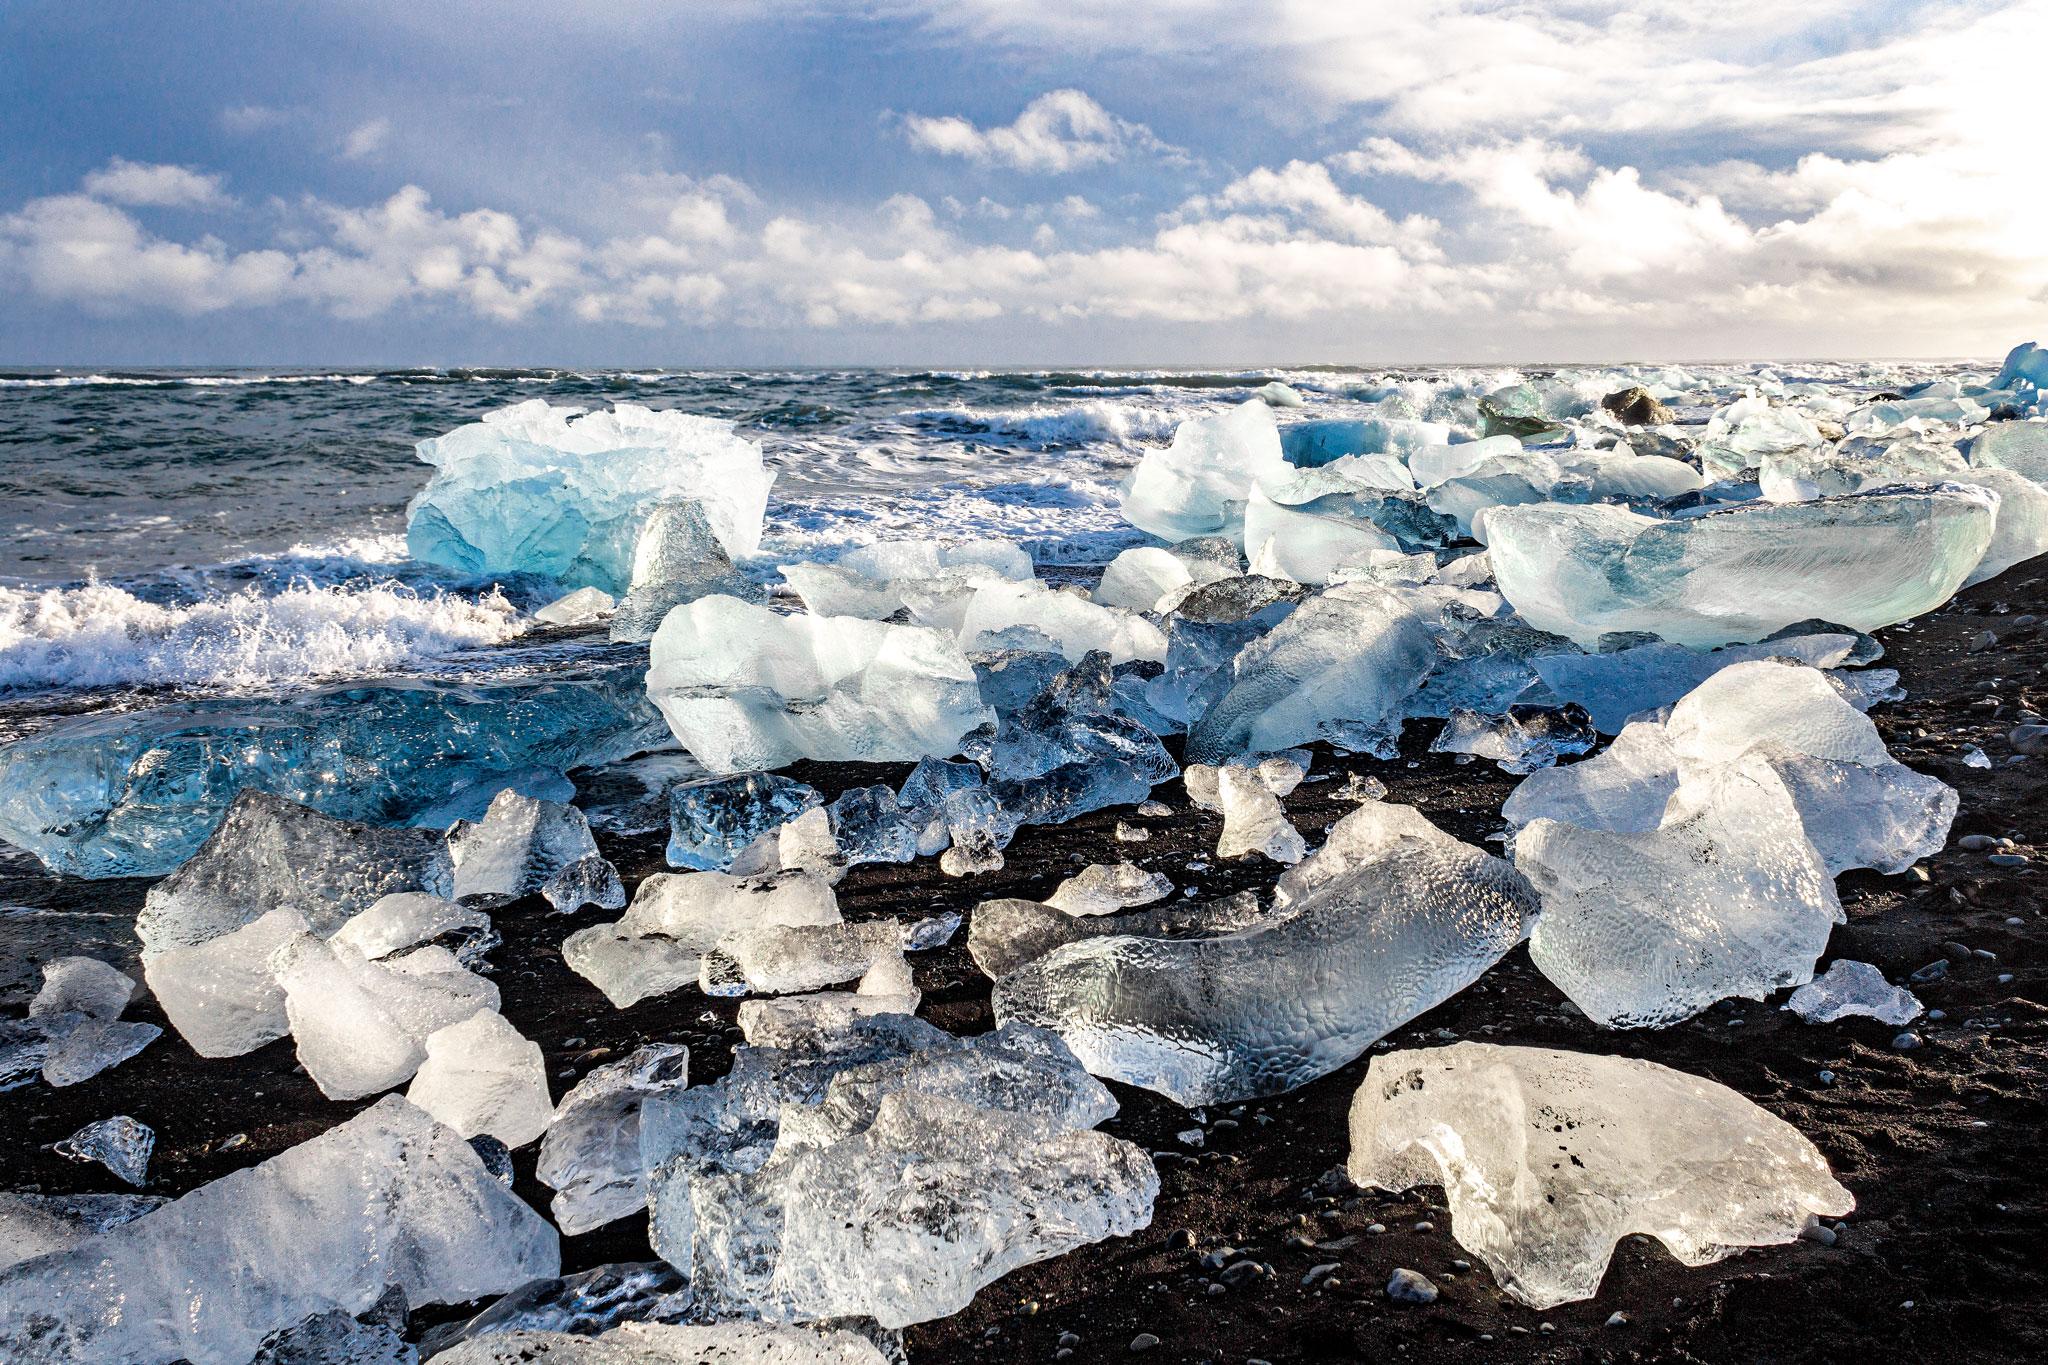 iceland diamond beach 7 day itinerary